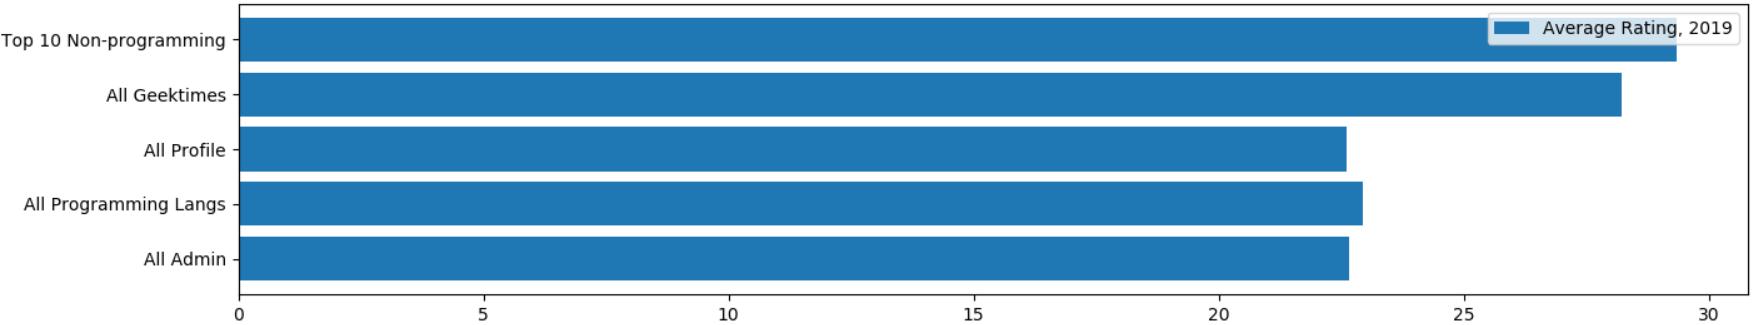 Хабрастатистика: небольшой анализ популярности хабов - 7